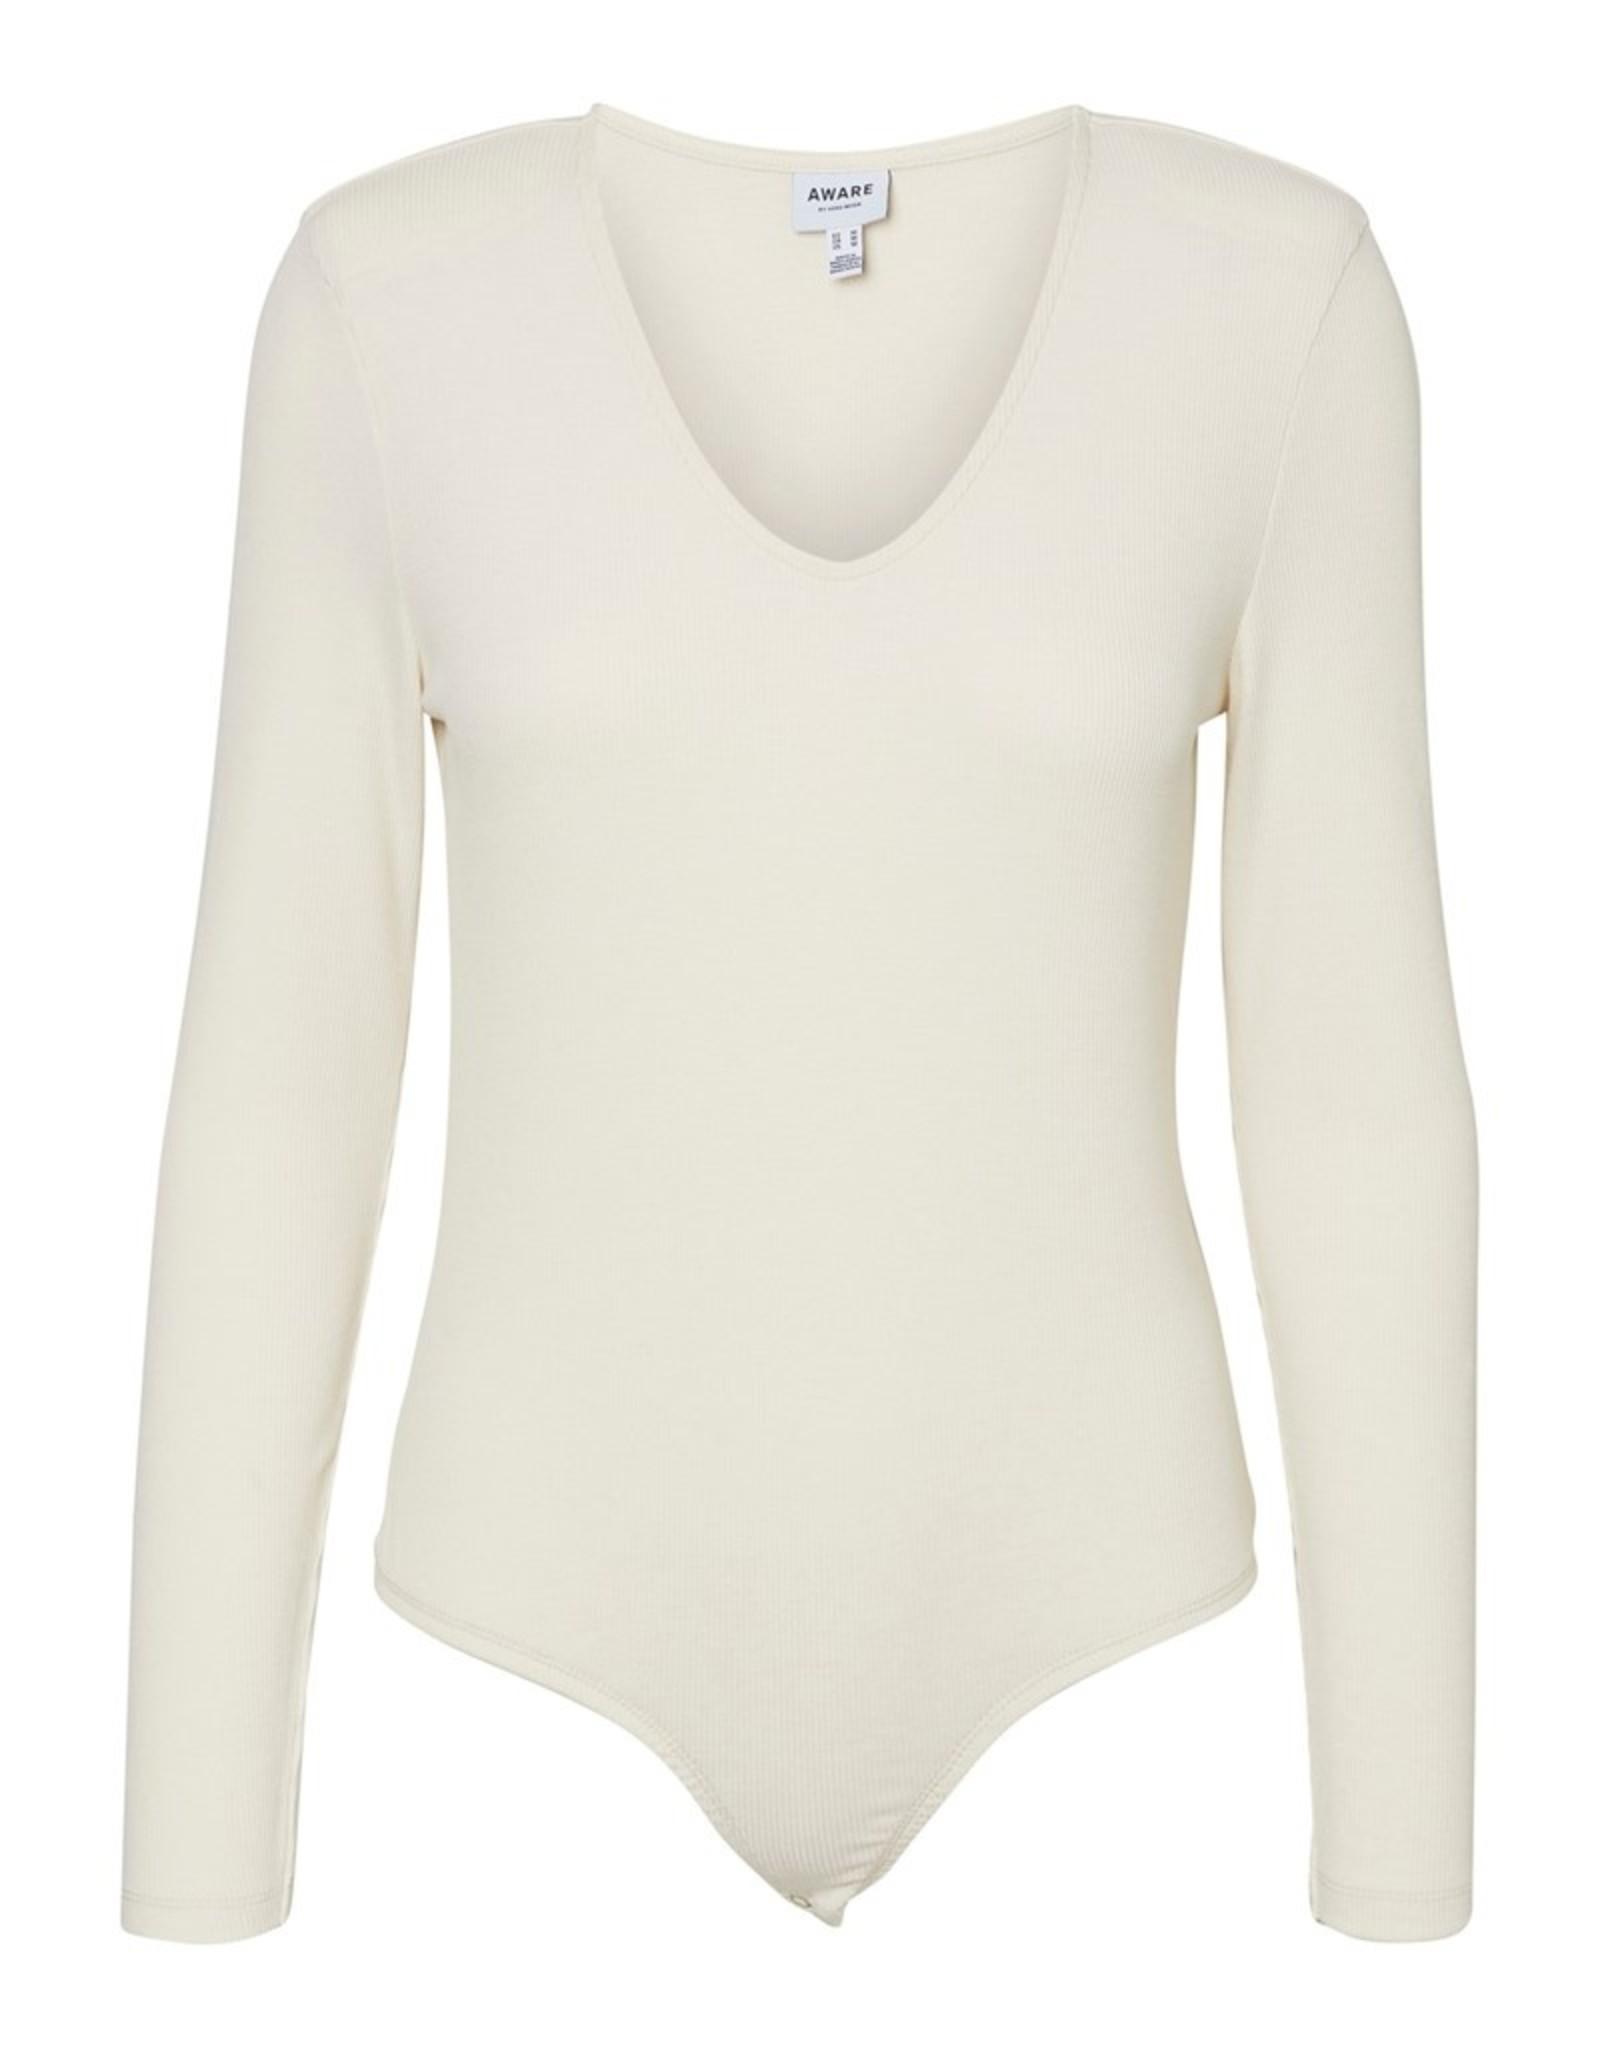 Vero Moda Ramone Ribbed Scoop-Neck Bodysuit